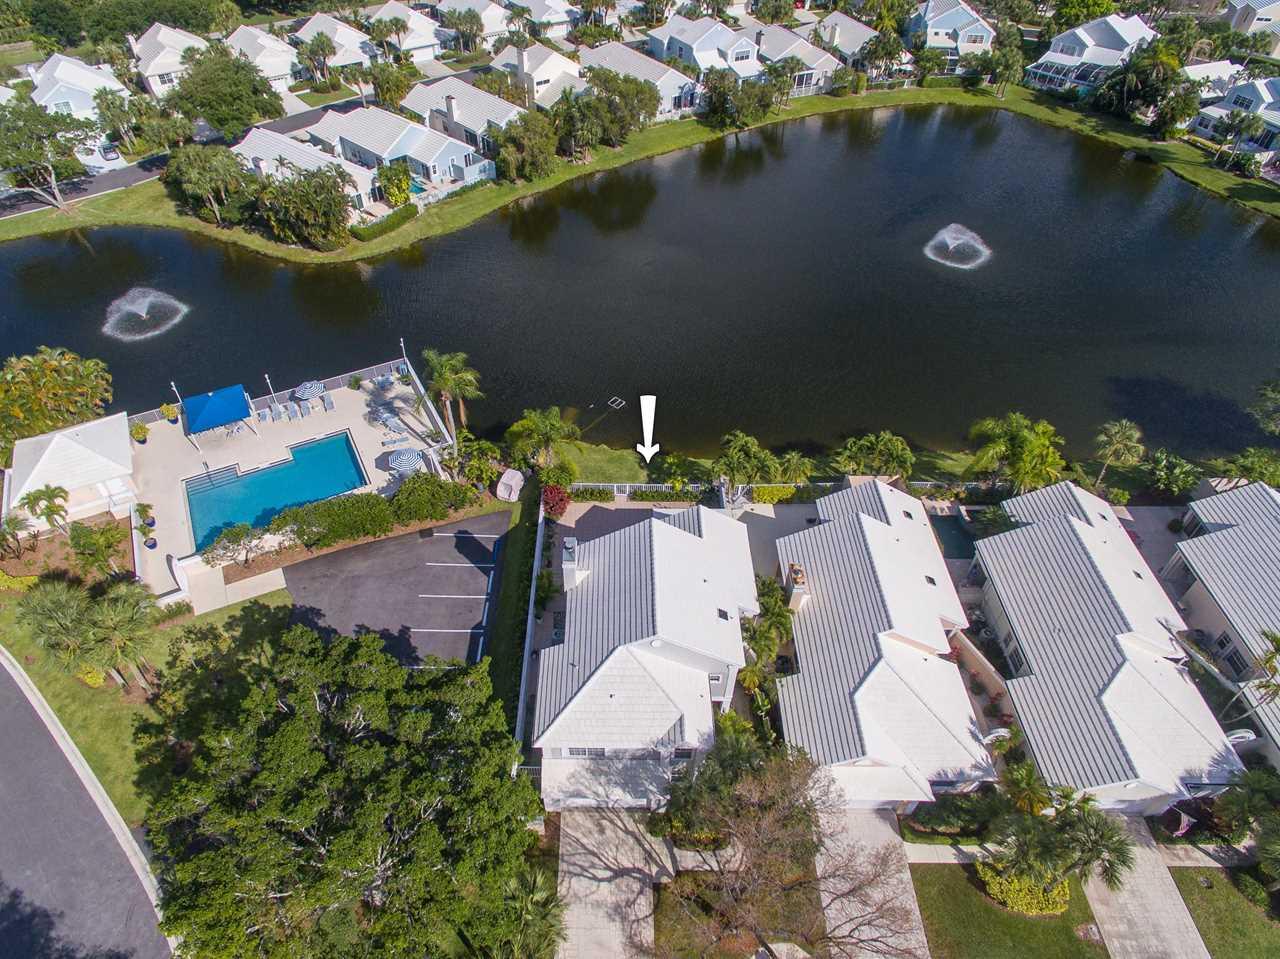 62 Dorchester Circle Palm Beach Gardens, FL 33418 | MLS RX-10513114 Photo 1